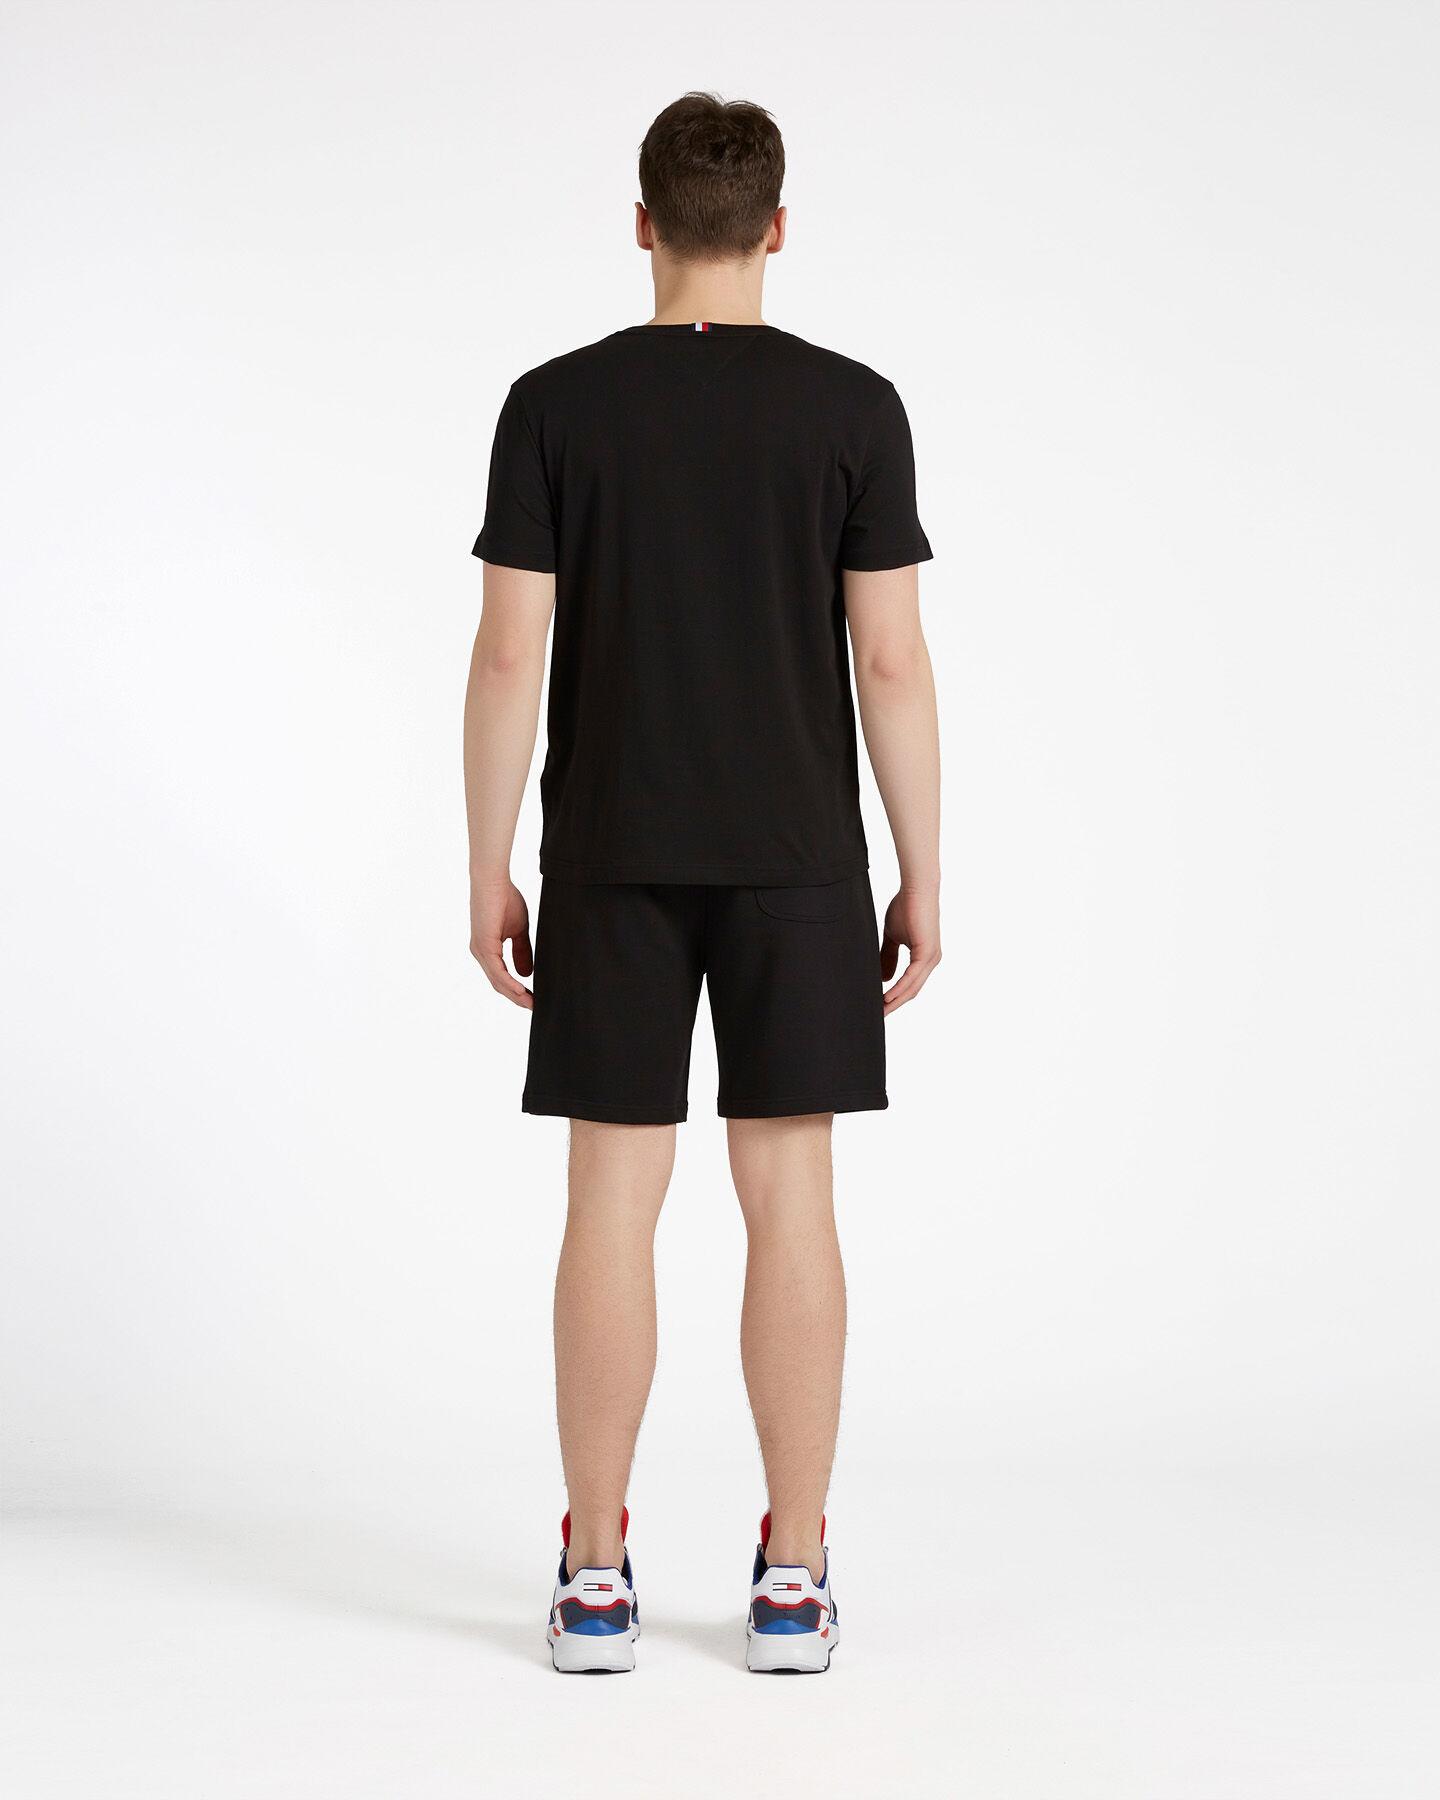 T-Shirt TOMMY HILFIGER ESSENTIAL M S4089510 scatto 2